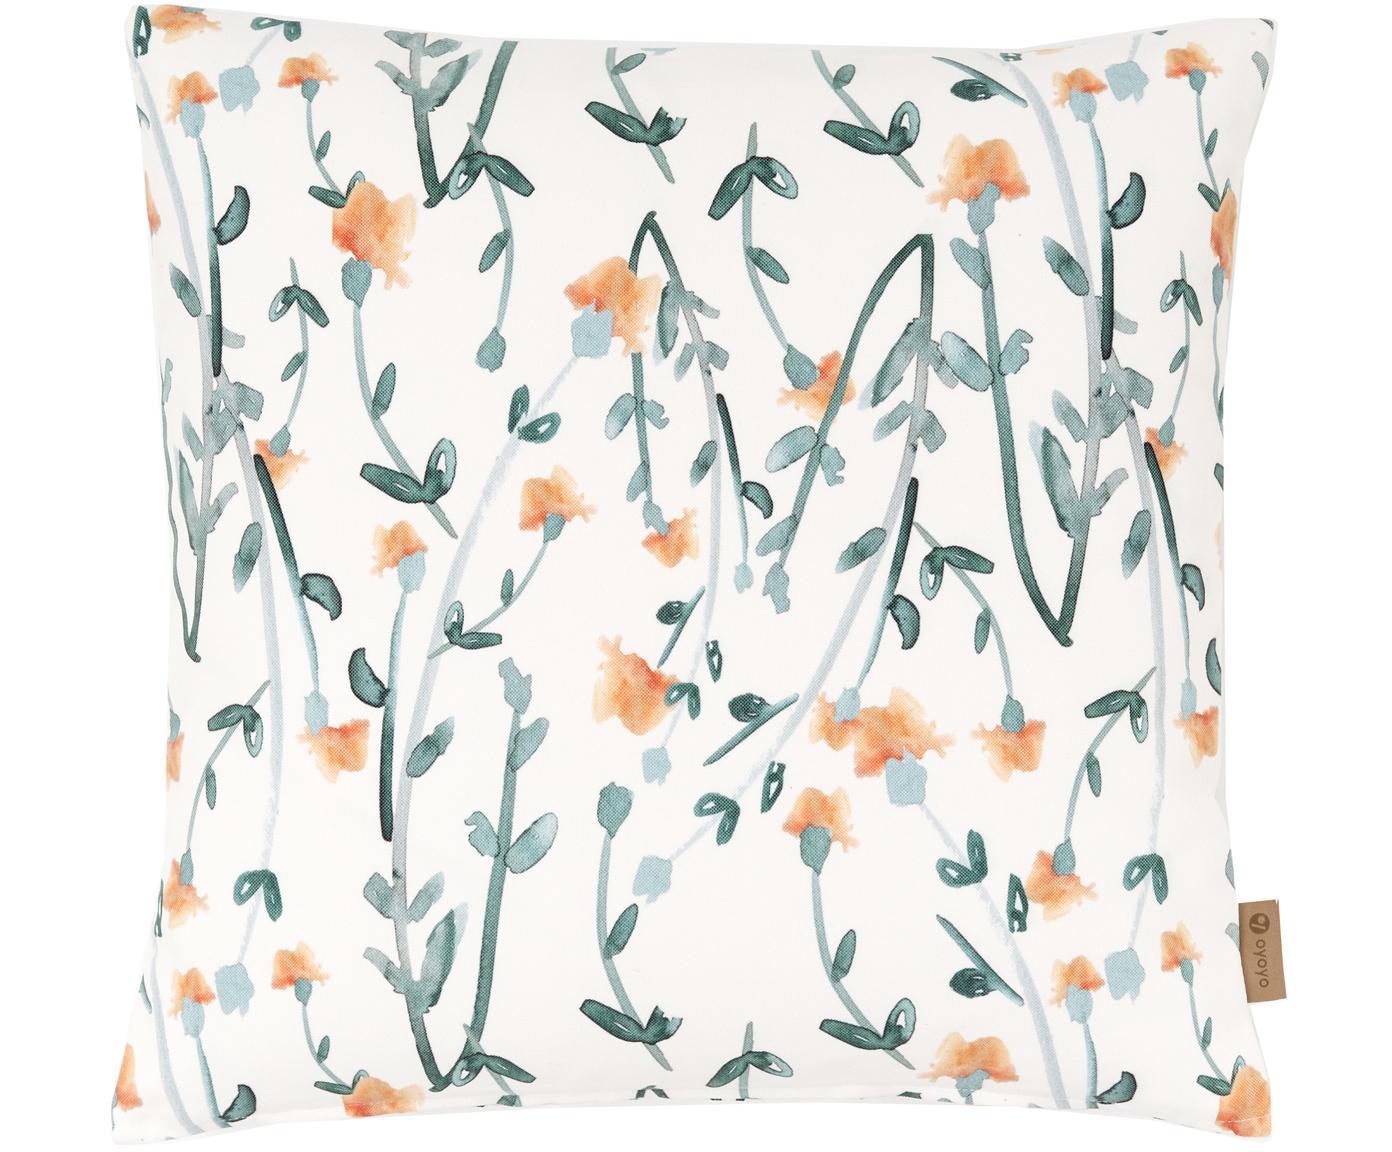 Federa arredo con motivo floreale Blütentraum, Poliestere, Bianco, verde, arancione, Larg. 50 x Lung. 50 cm